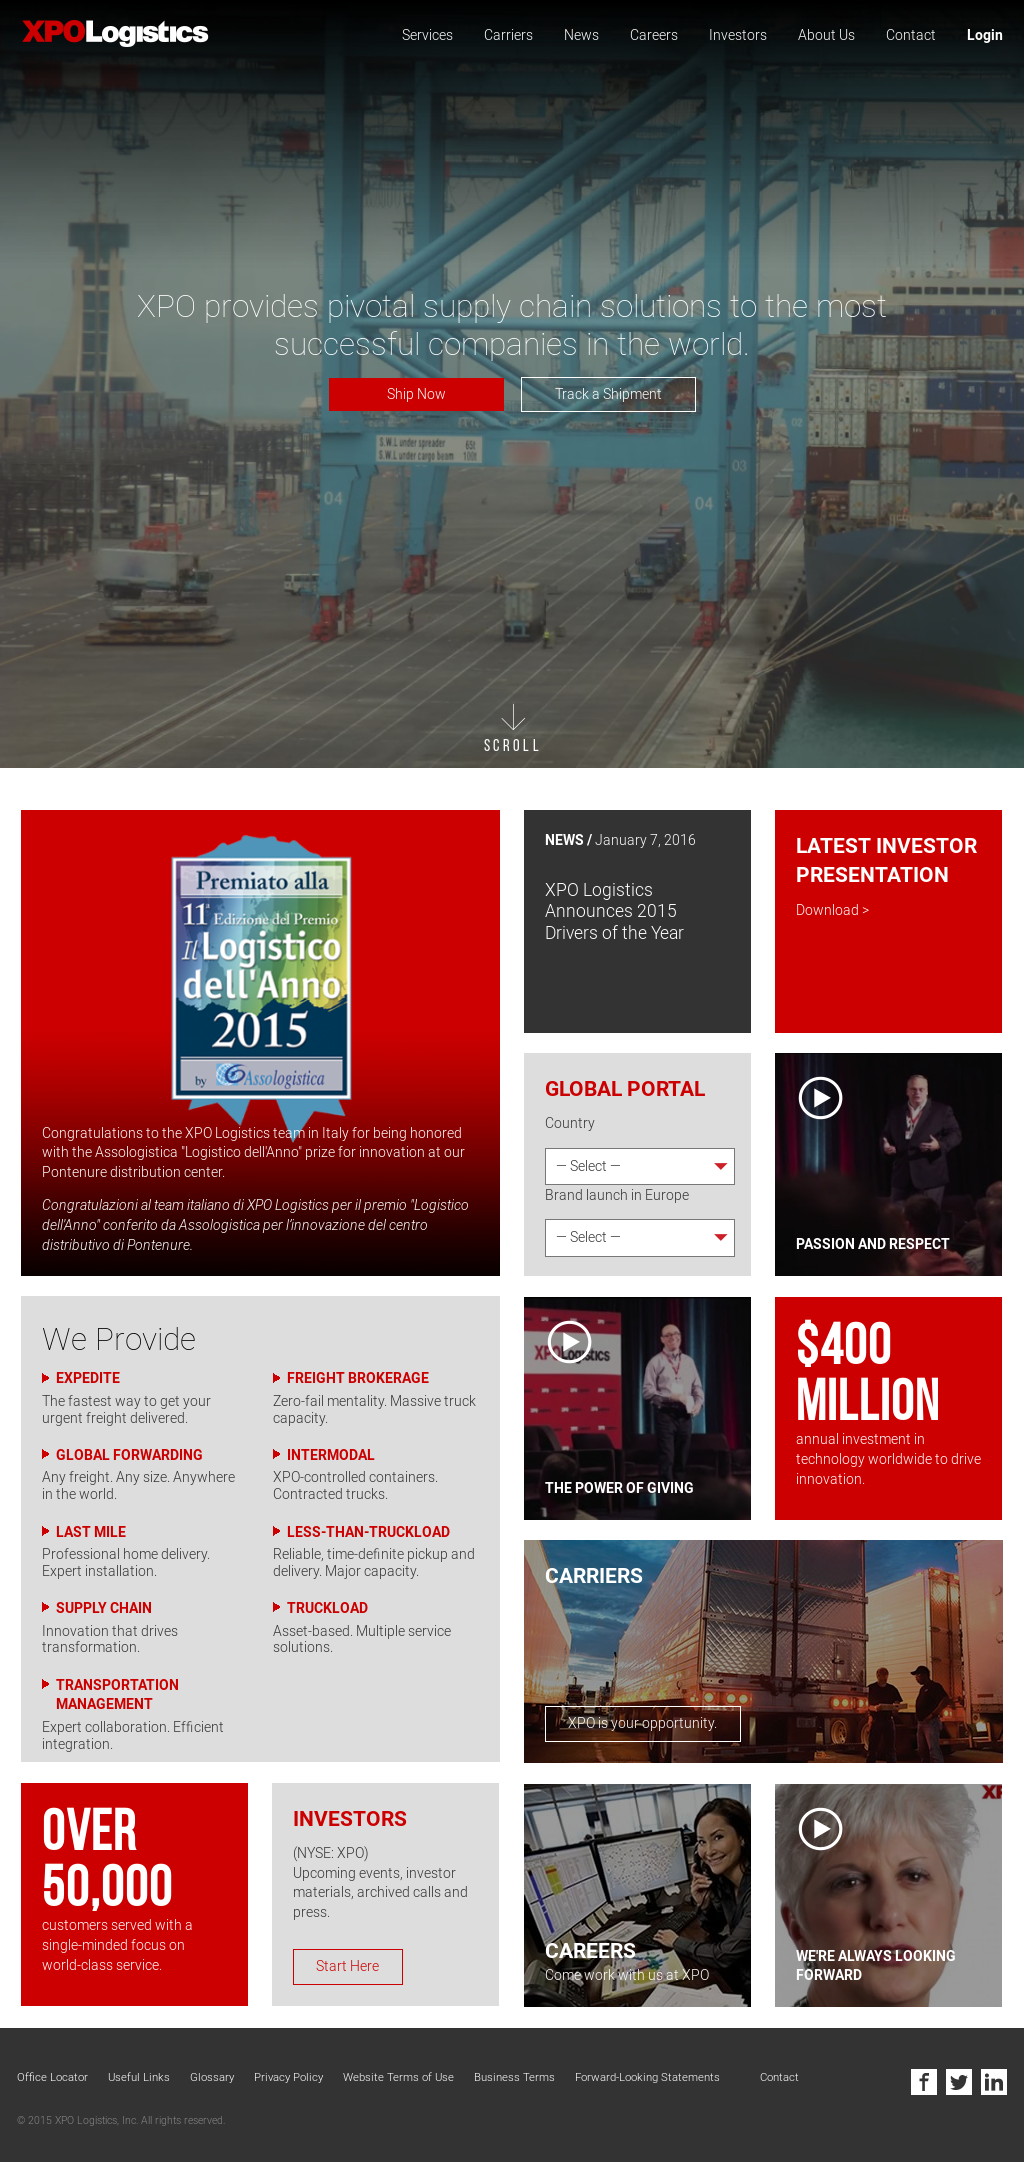 XPO Logistics Competitors, Revenue and Employees - Owler Company Profile